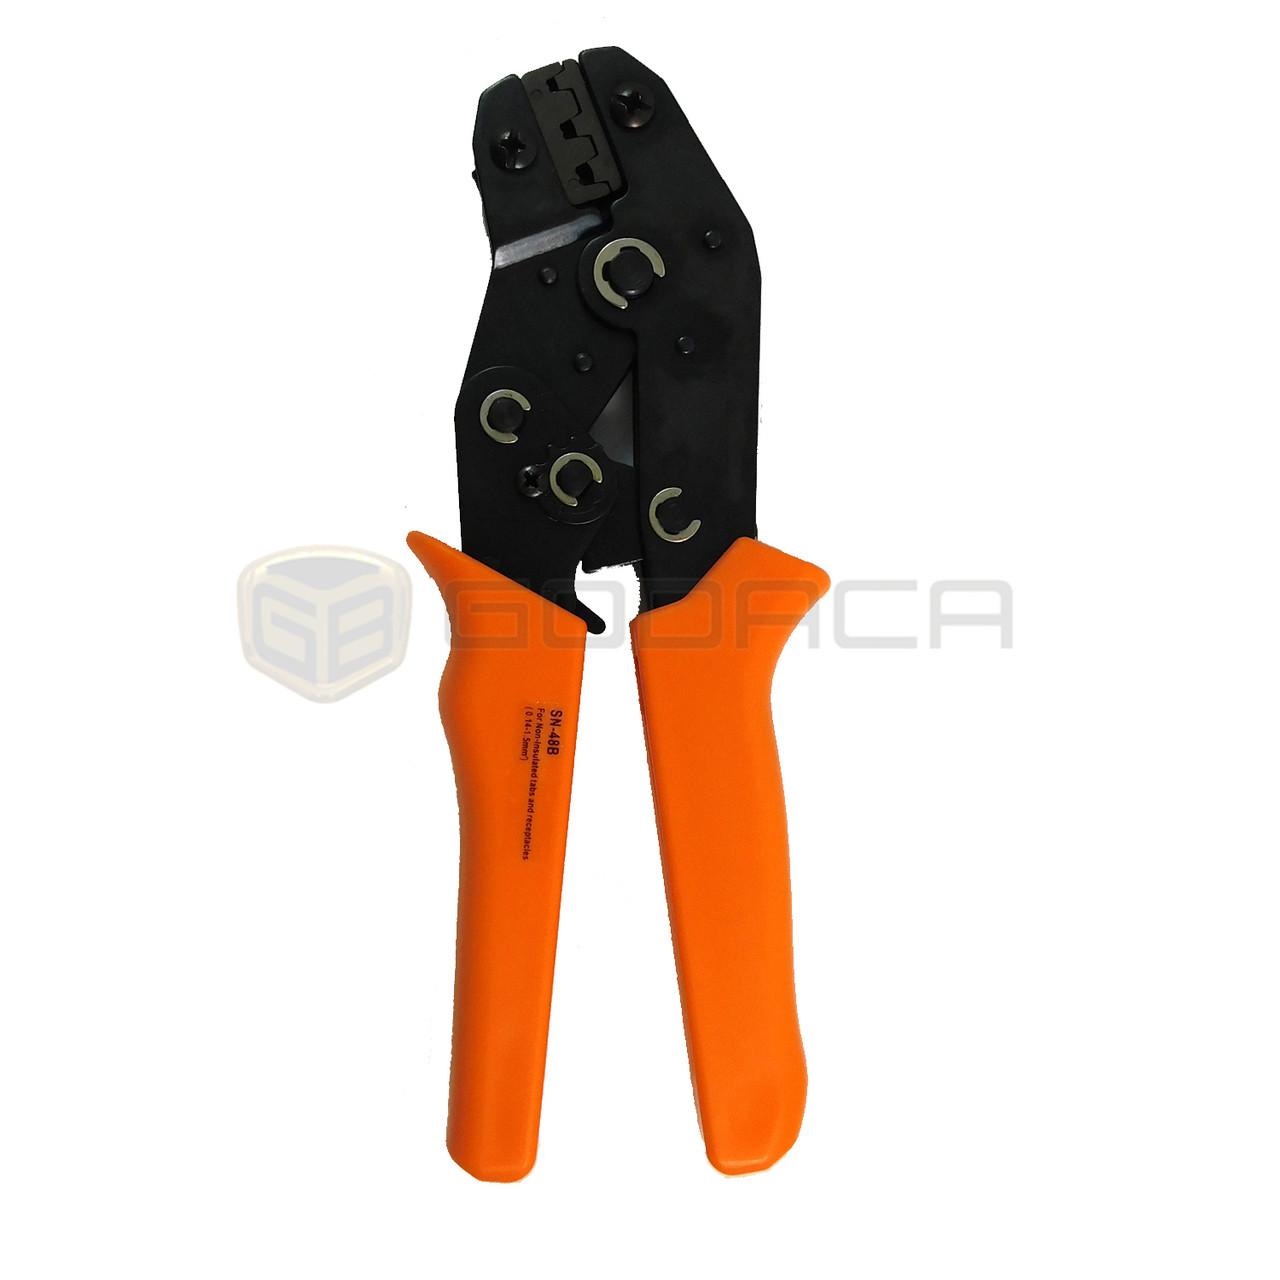 1x crimping tool sn-48b for molex deutsch pin 0 5mm 1 0mm 1 5mm - godaca,  llc